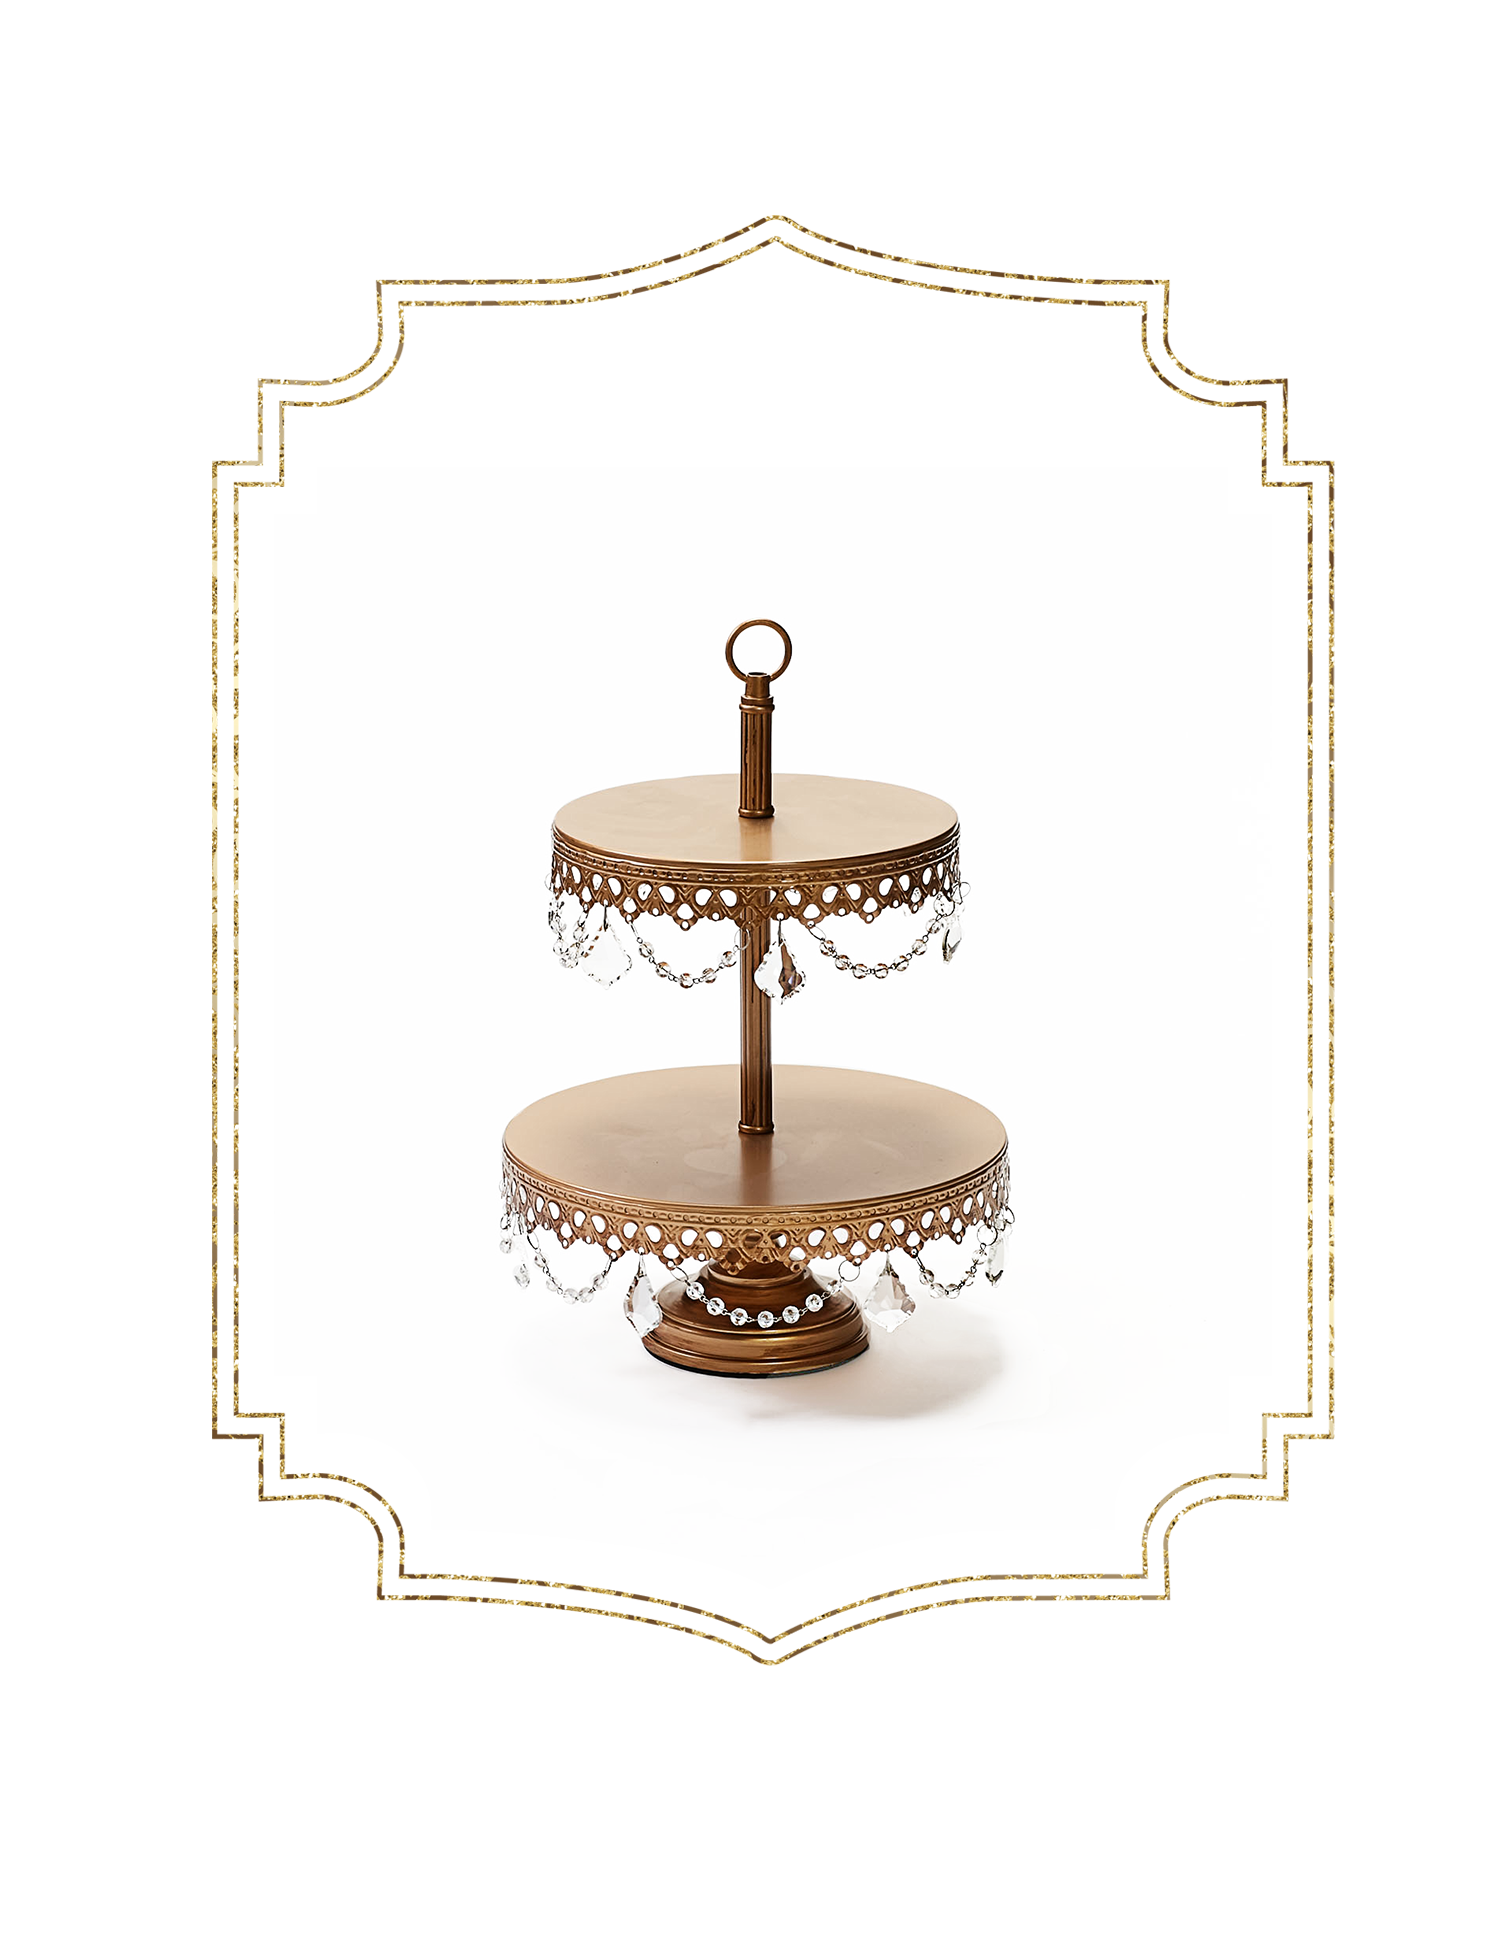 SHOP-preview ANTIQUE GOLD chandelier 2 tier dessert stand.png